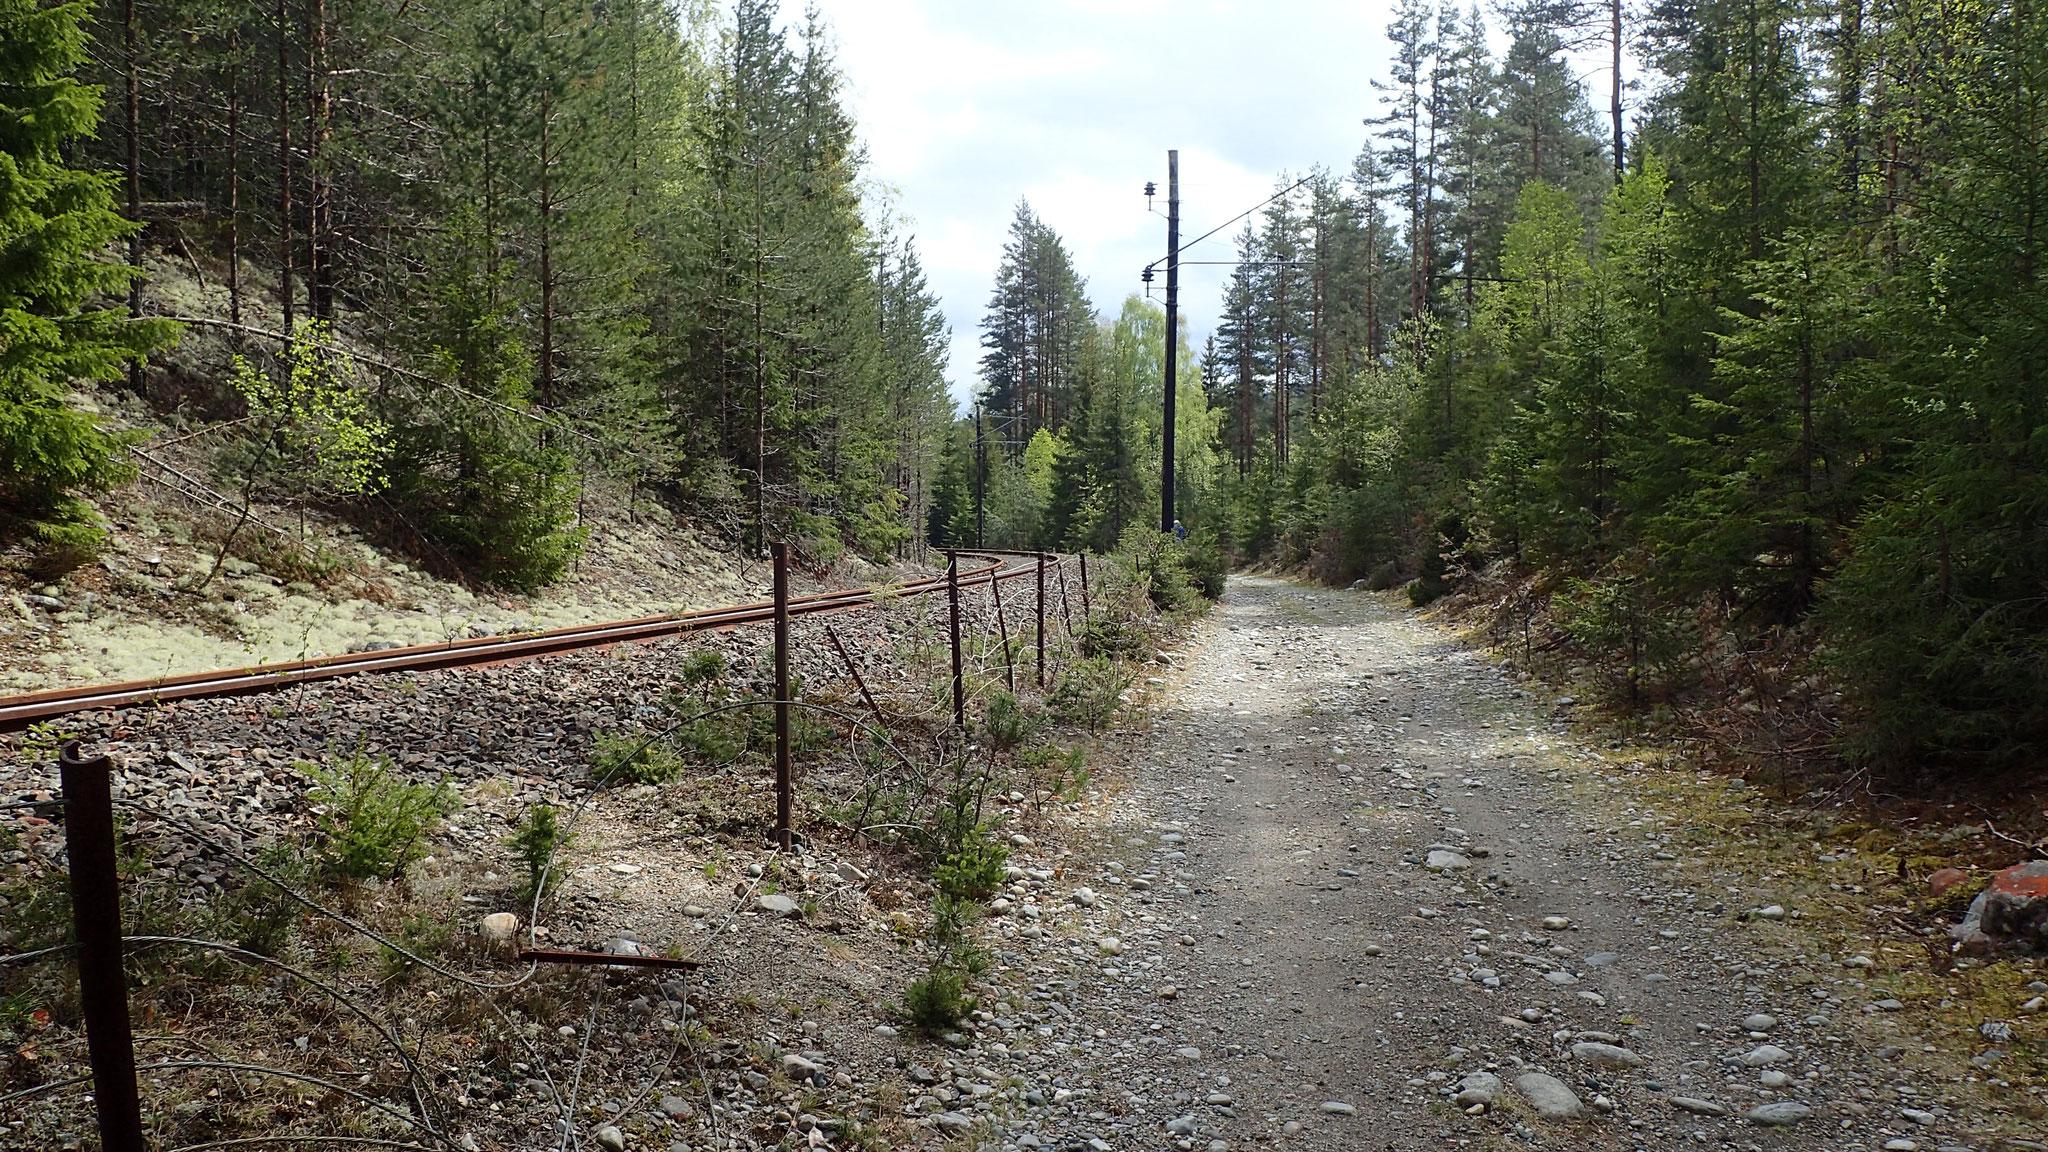 langs nedlagd jernbanespor